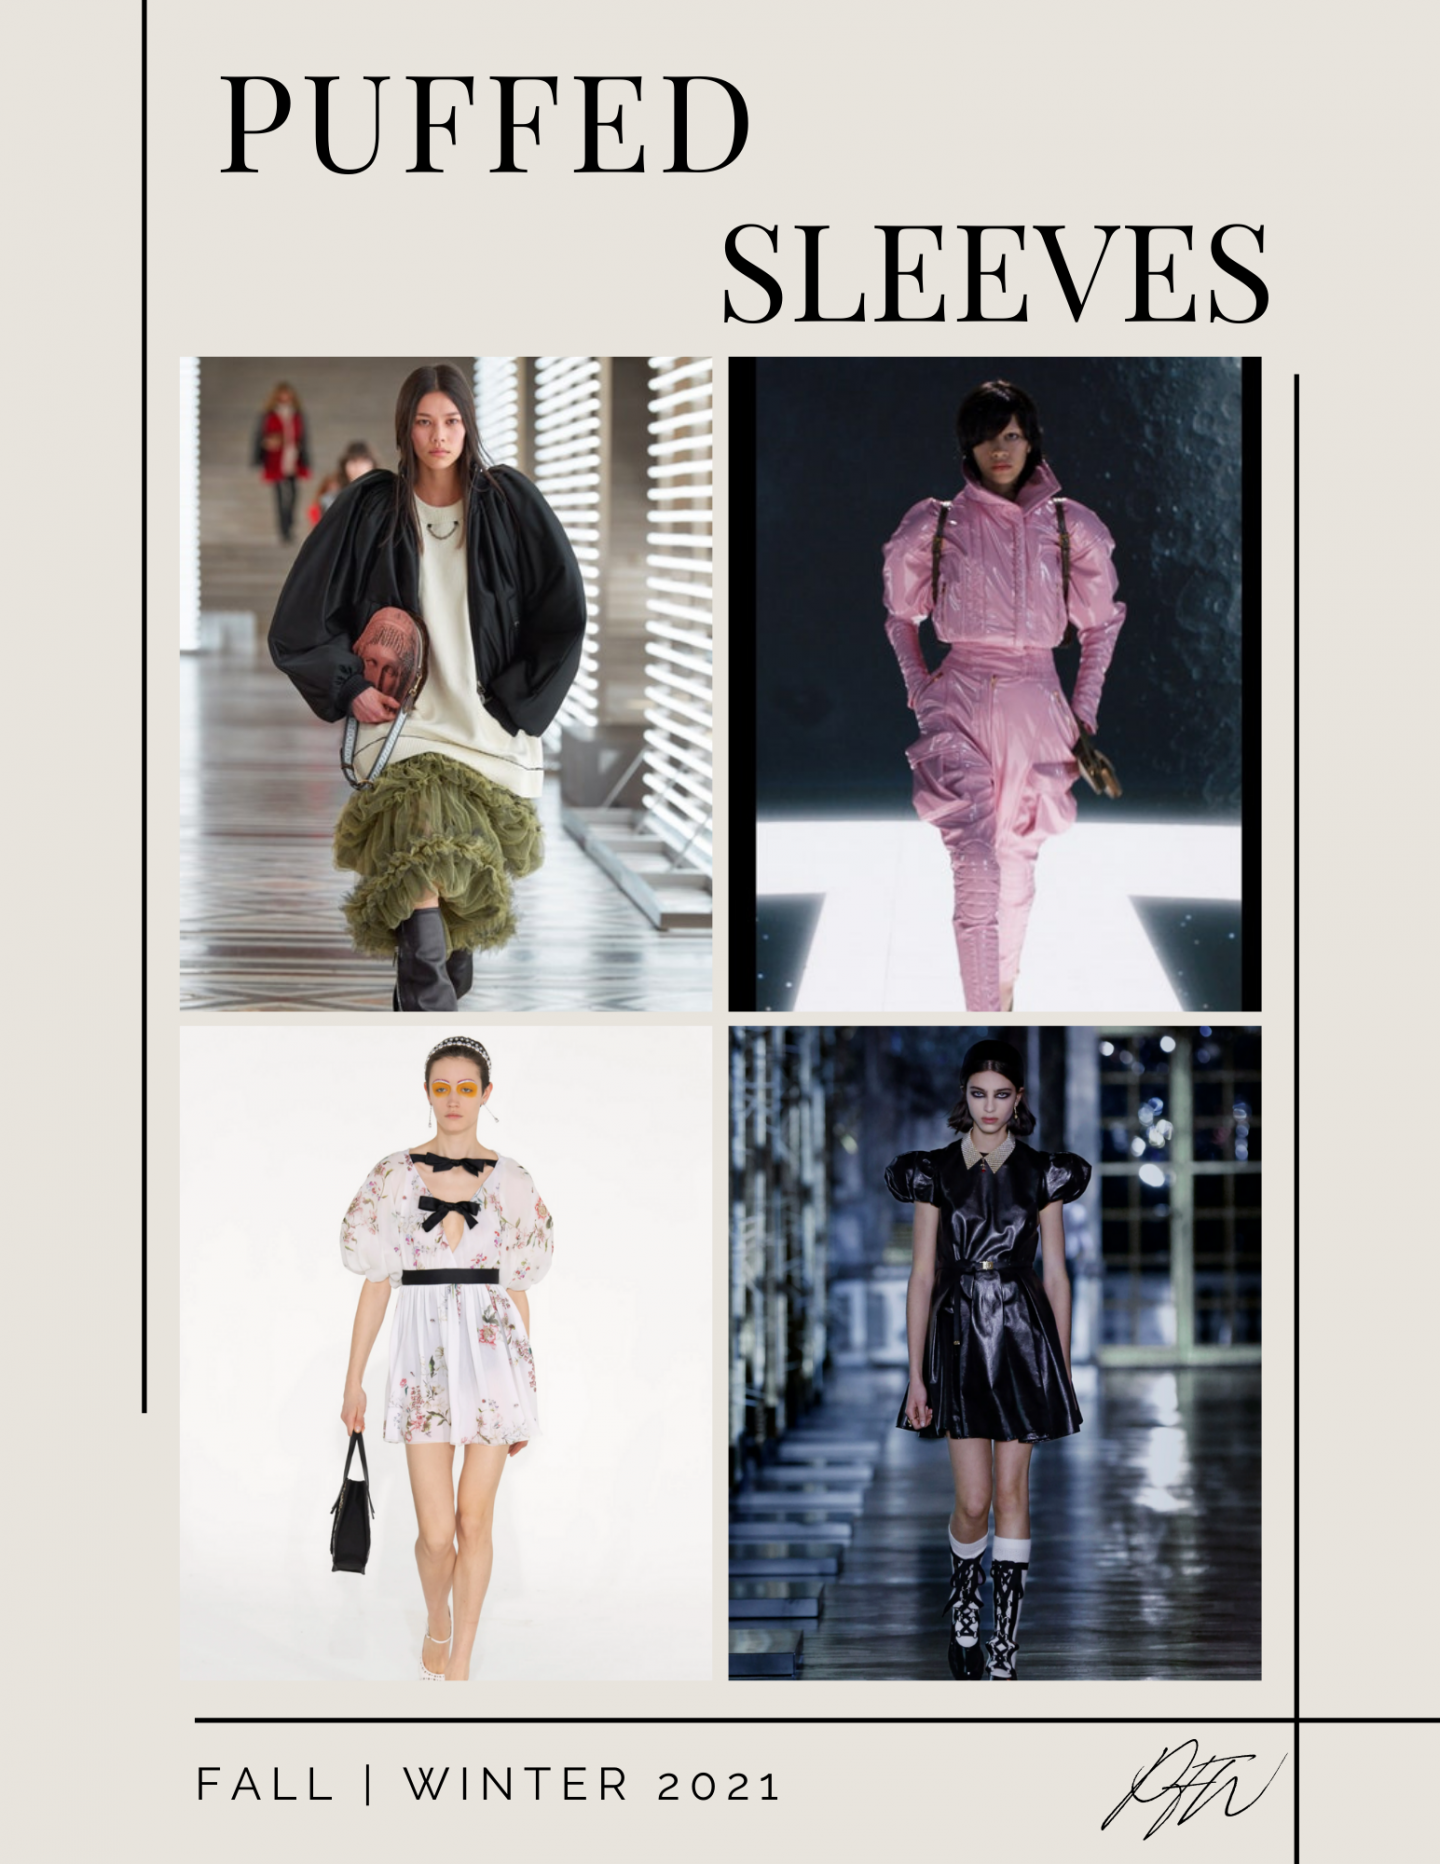 Paris Fashion Week Fall Winter Puffed Sleeves Looks